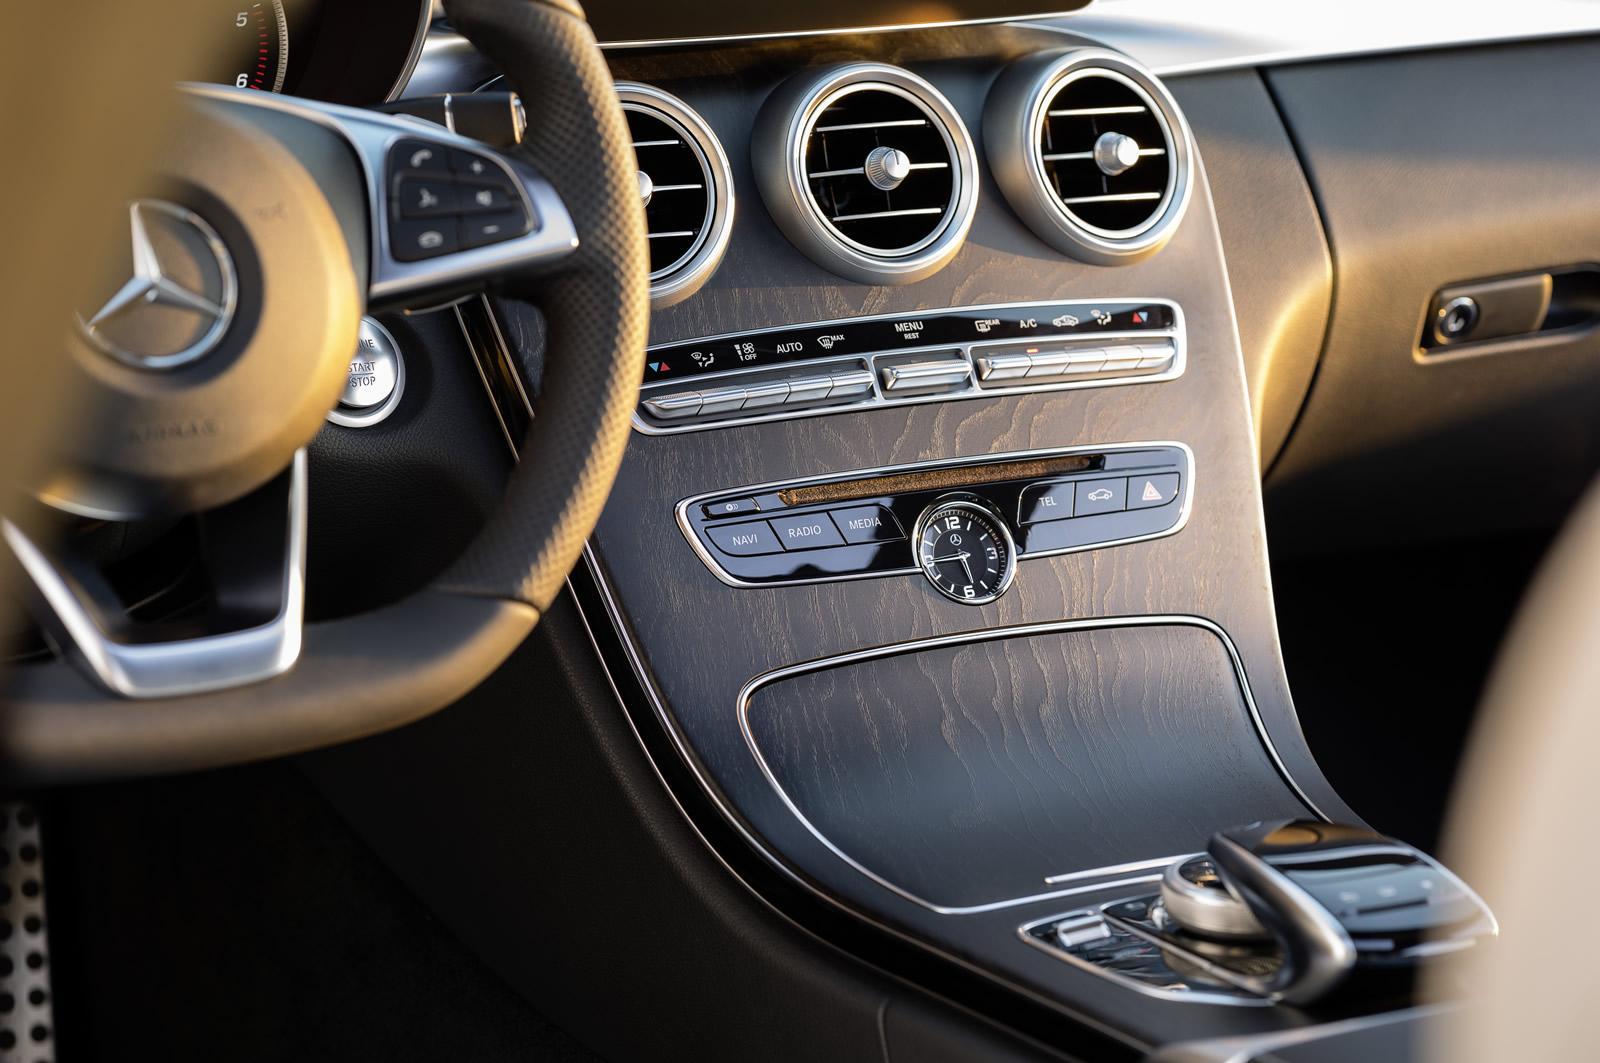 Mercedes-Benz Clase C Estate 2014 interior 05